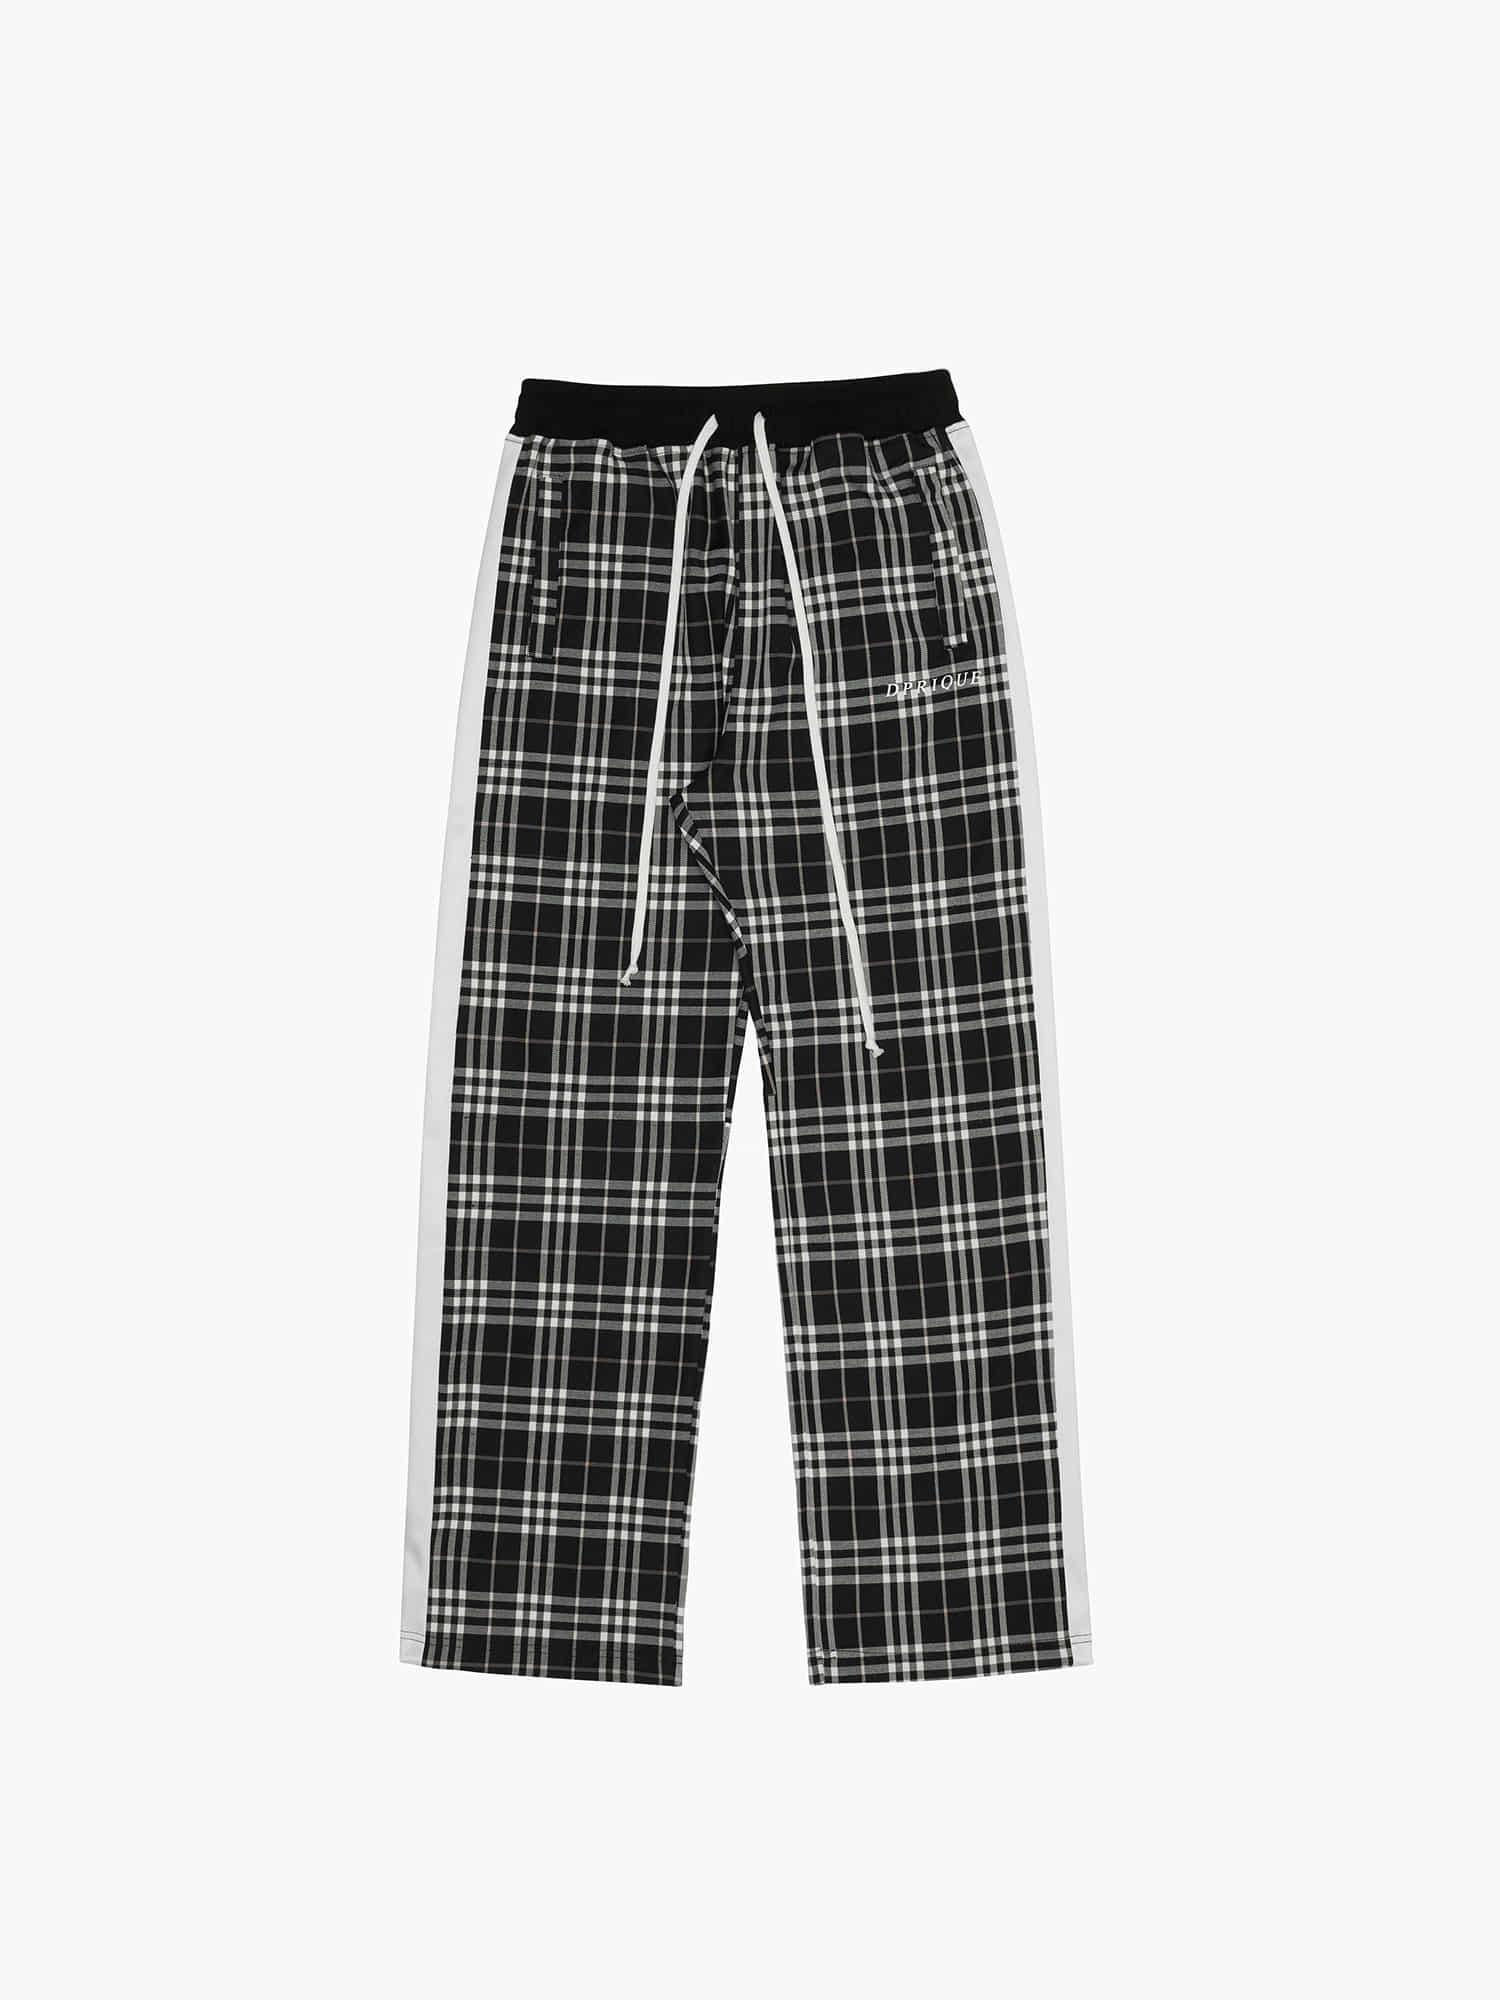 Check Track Pants Black/White